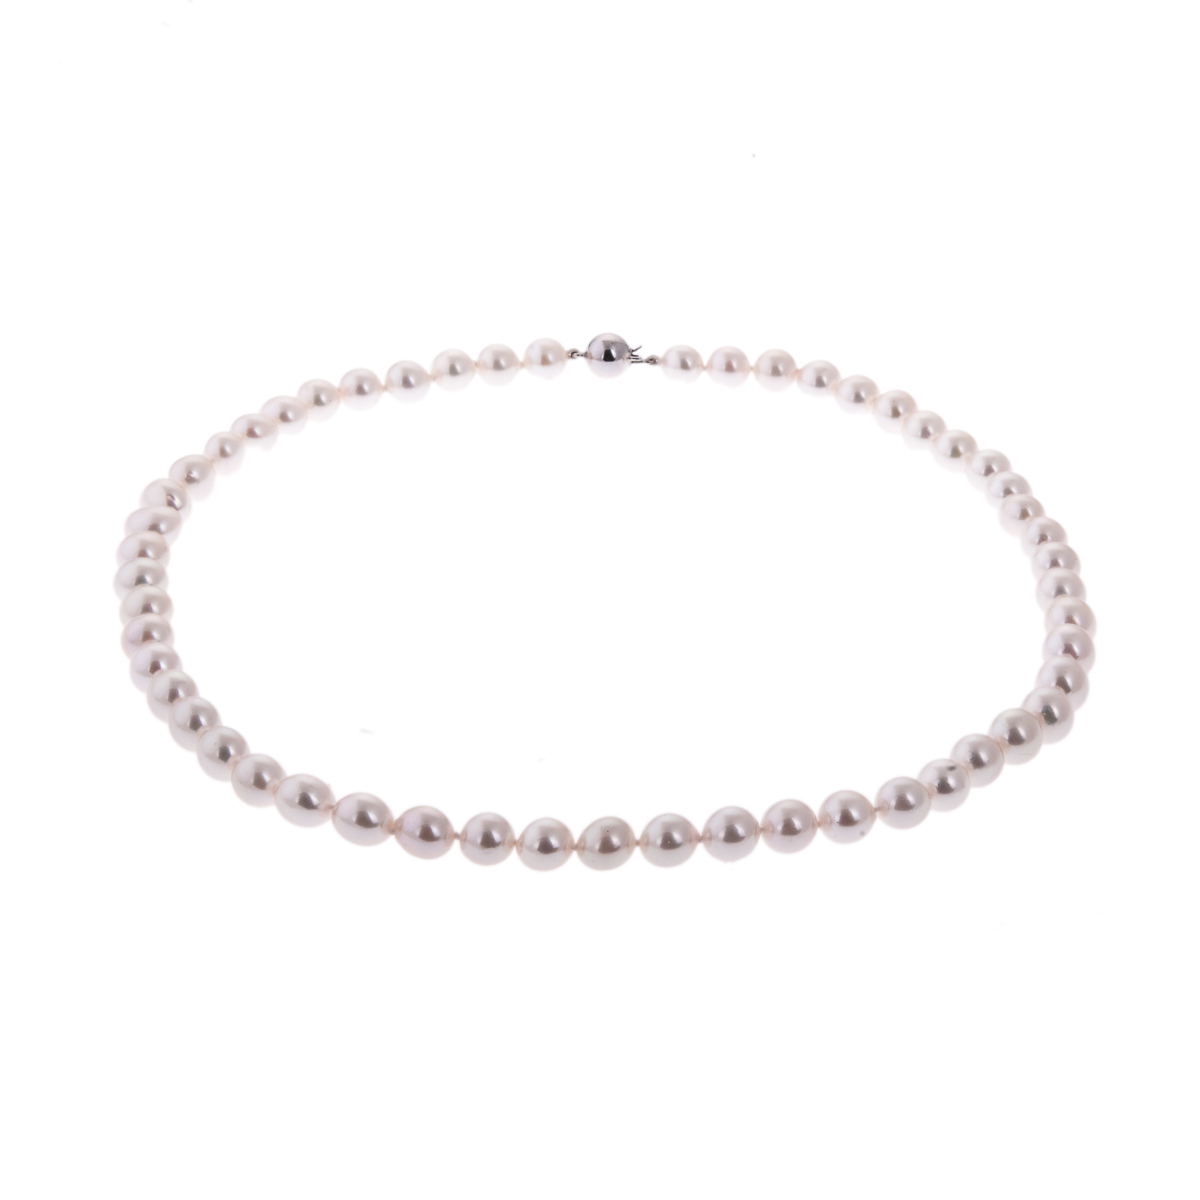 single-row-of-graduated-south-sea-pearls